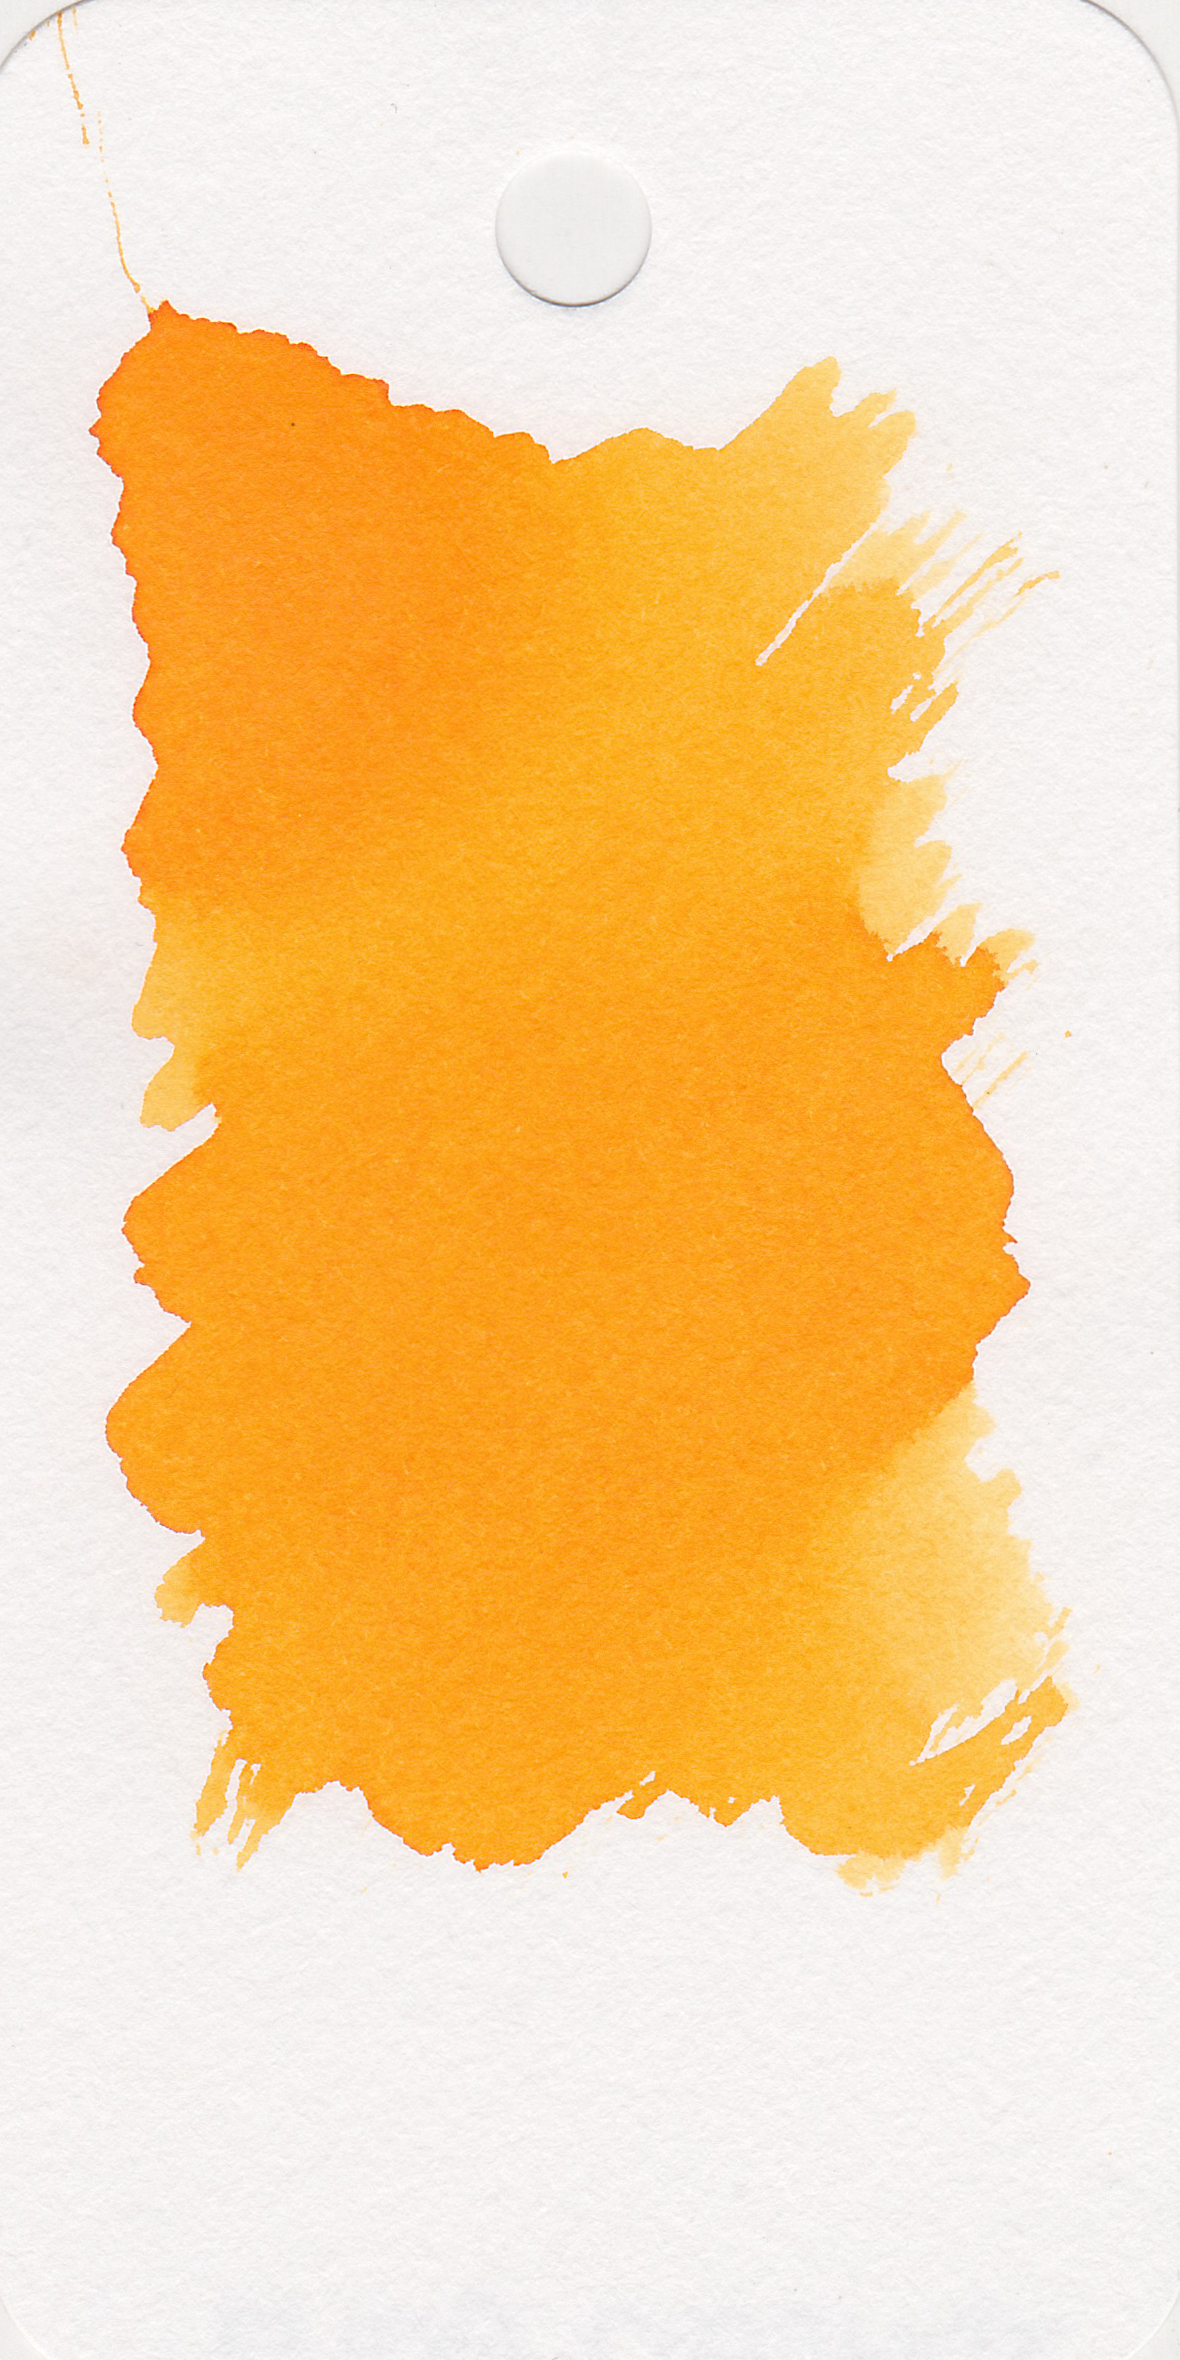 mb-golden-yellow-2.jpg